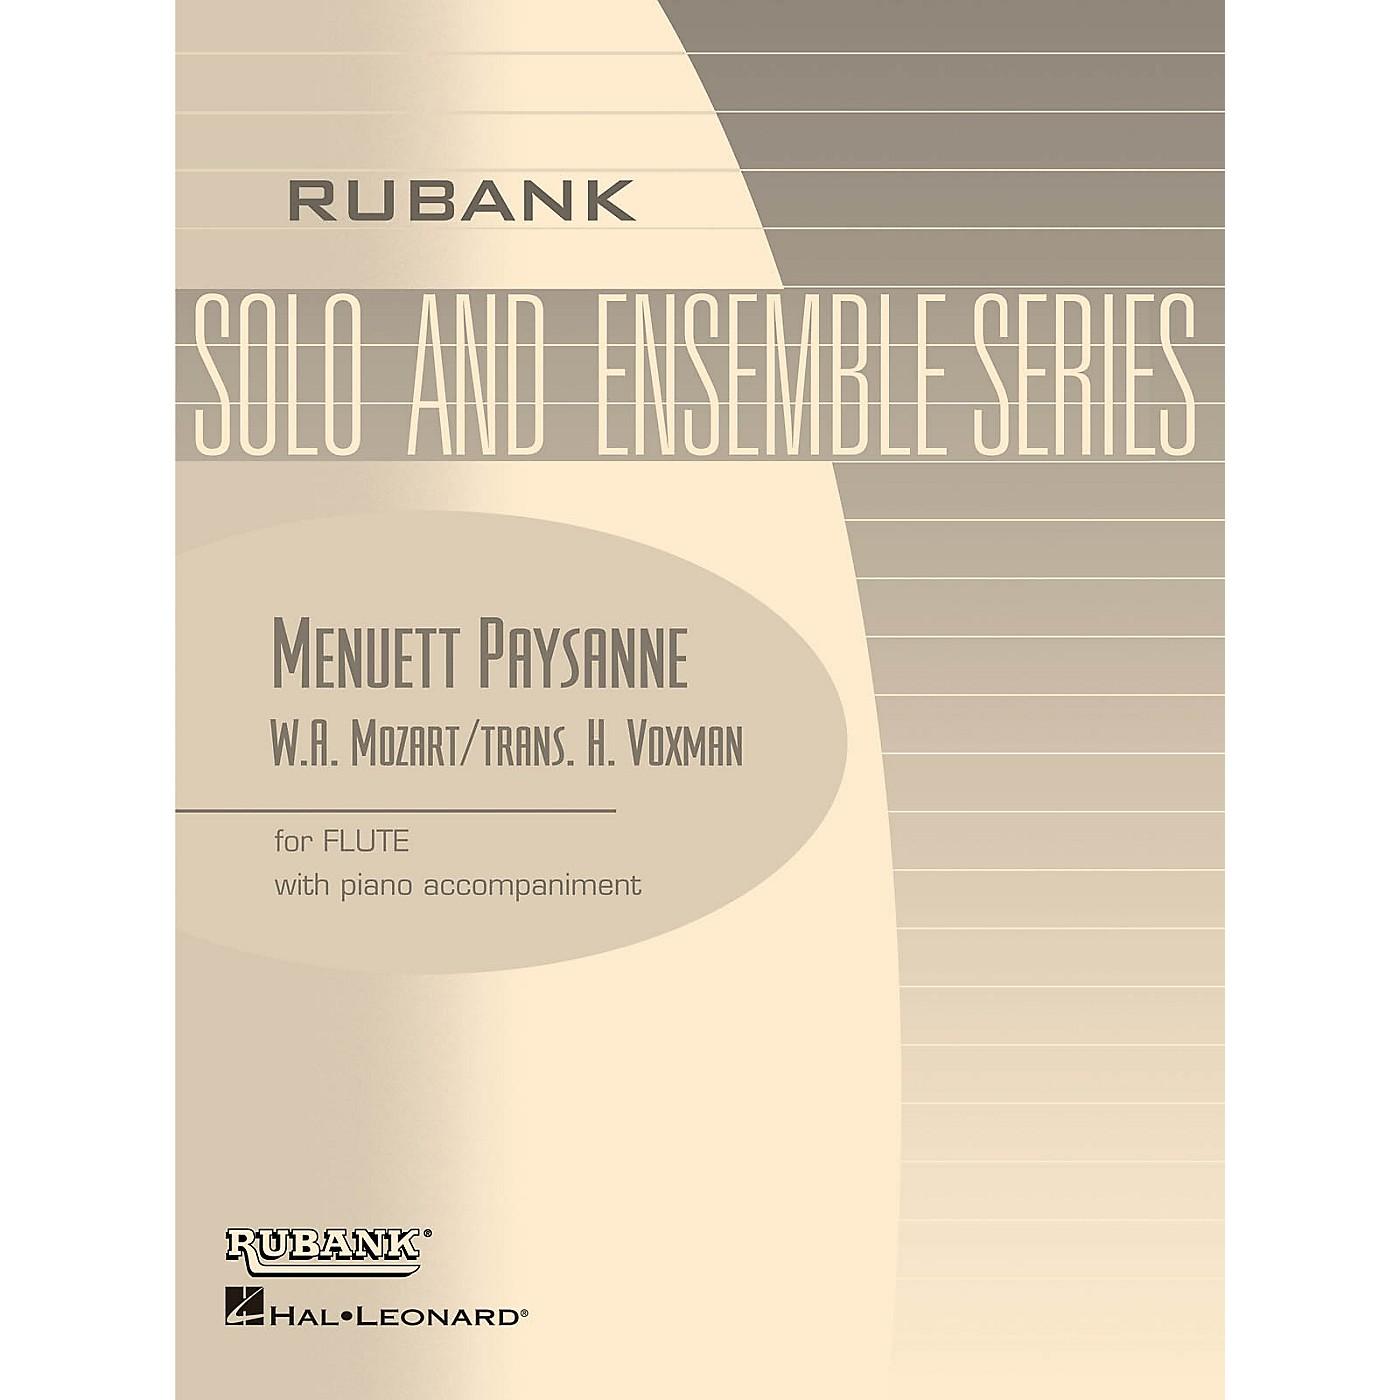 Rubank Publications Menuett Paysanne (Flute Solo with Piano - Grade 2) Rubank Solo/Ensemble Sheet Series thumbnail